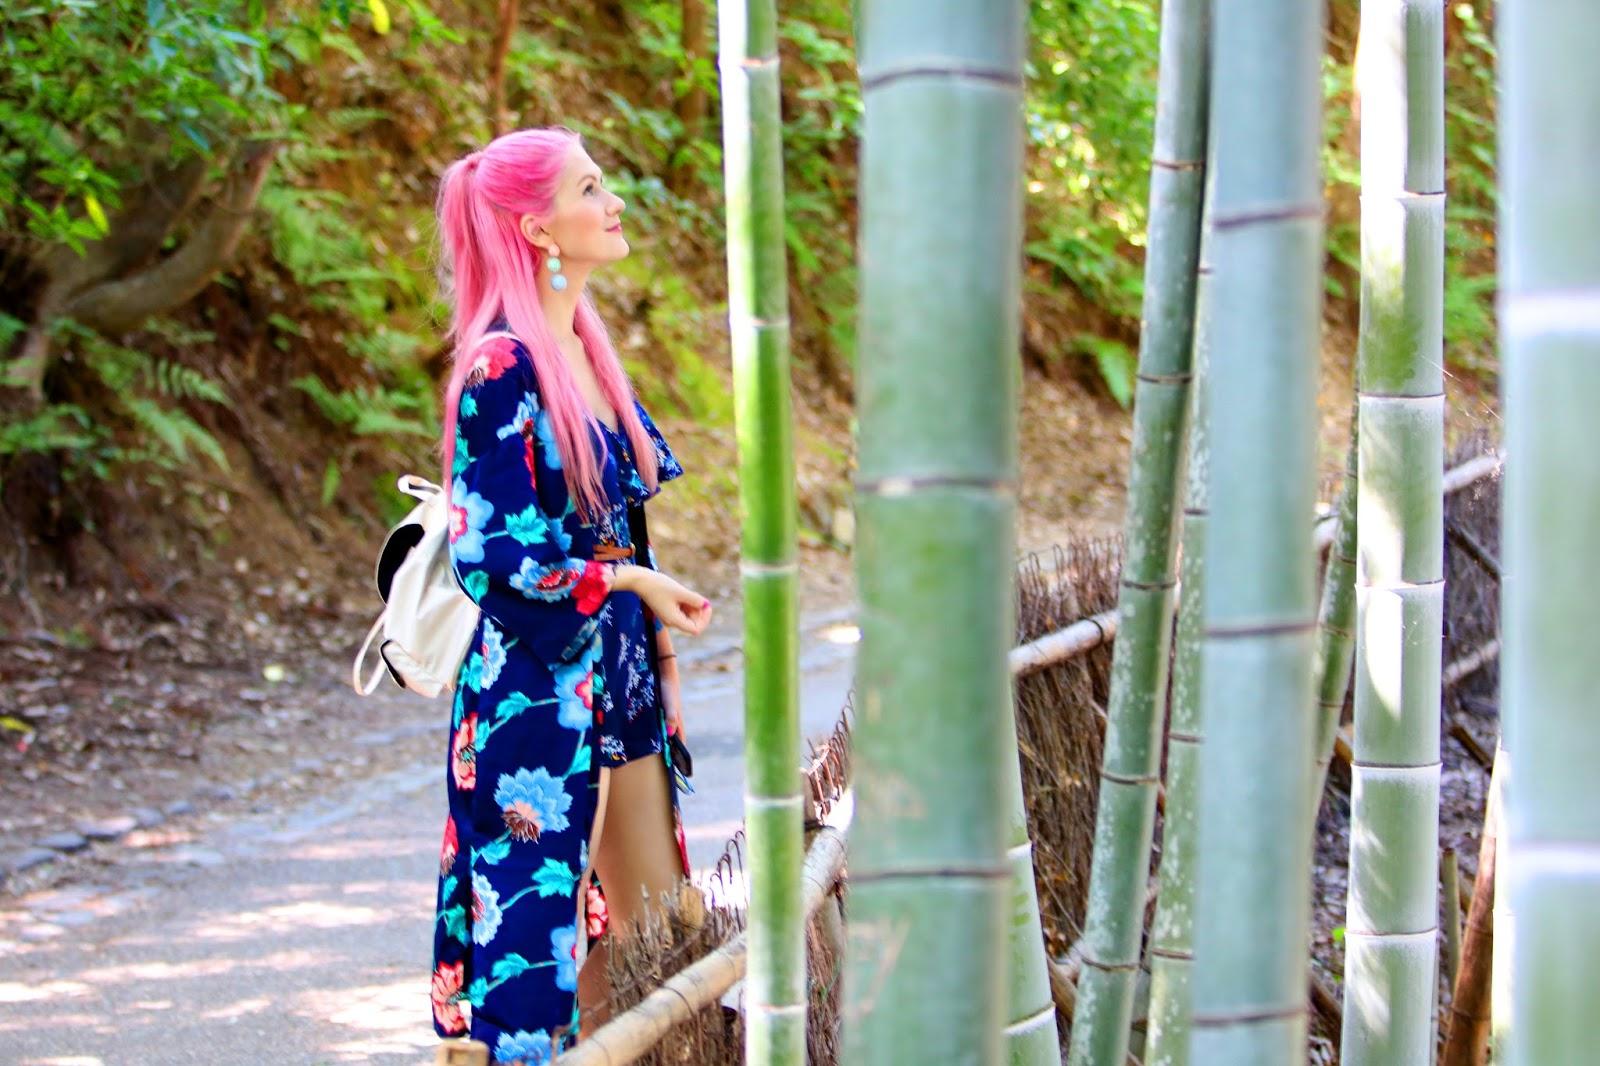 Vlog of the beautiful Bamboo forest in Arashiyama, Japan